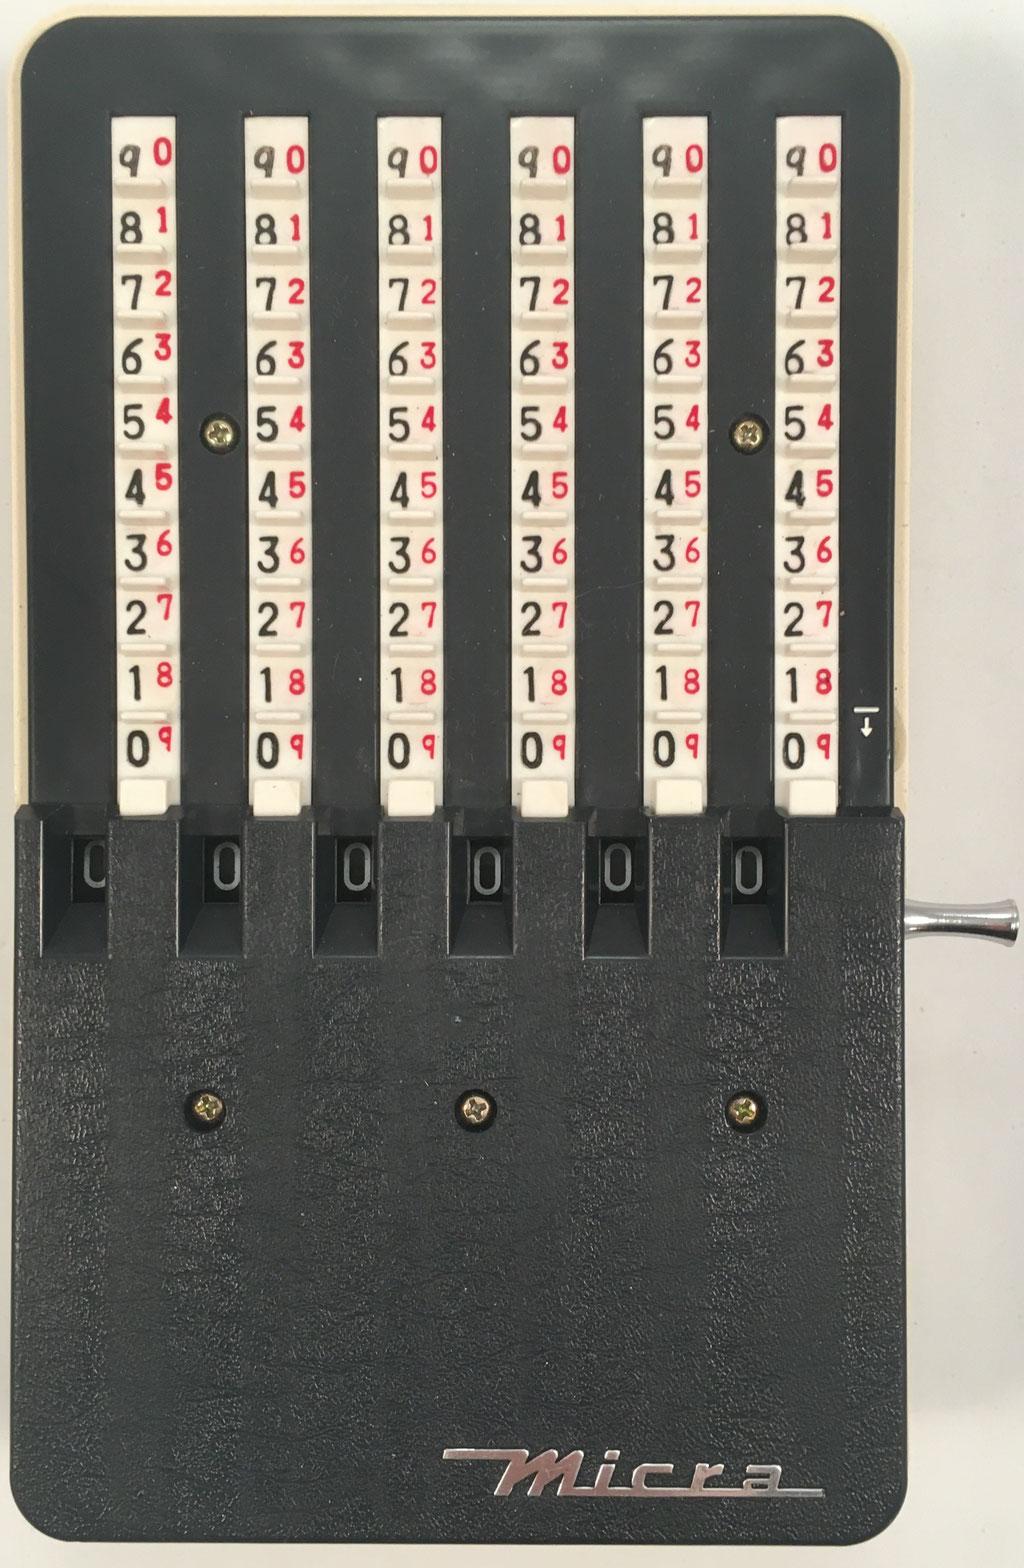 Sumadora MIKKURA ADDER (MICRA), fabricada en Japón por Mikkura Seiki, nº patentes 078895 y 078896, 19x10 cm